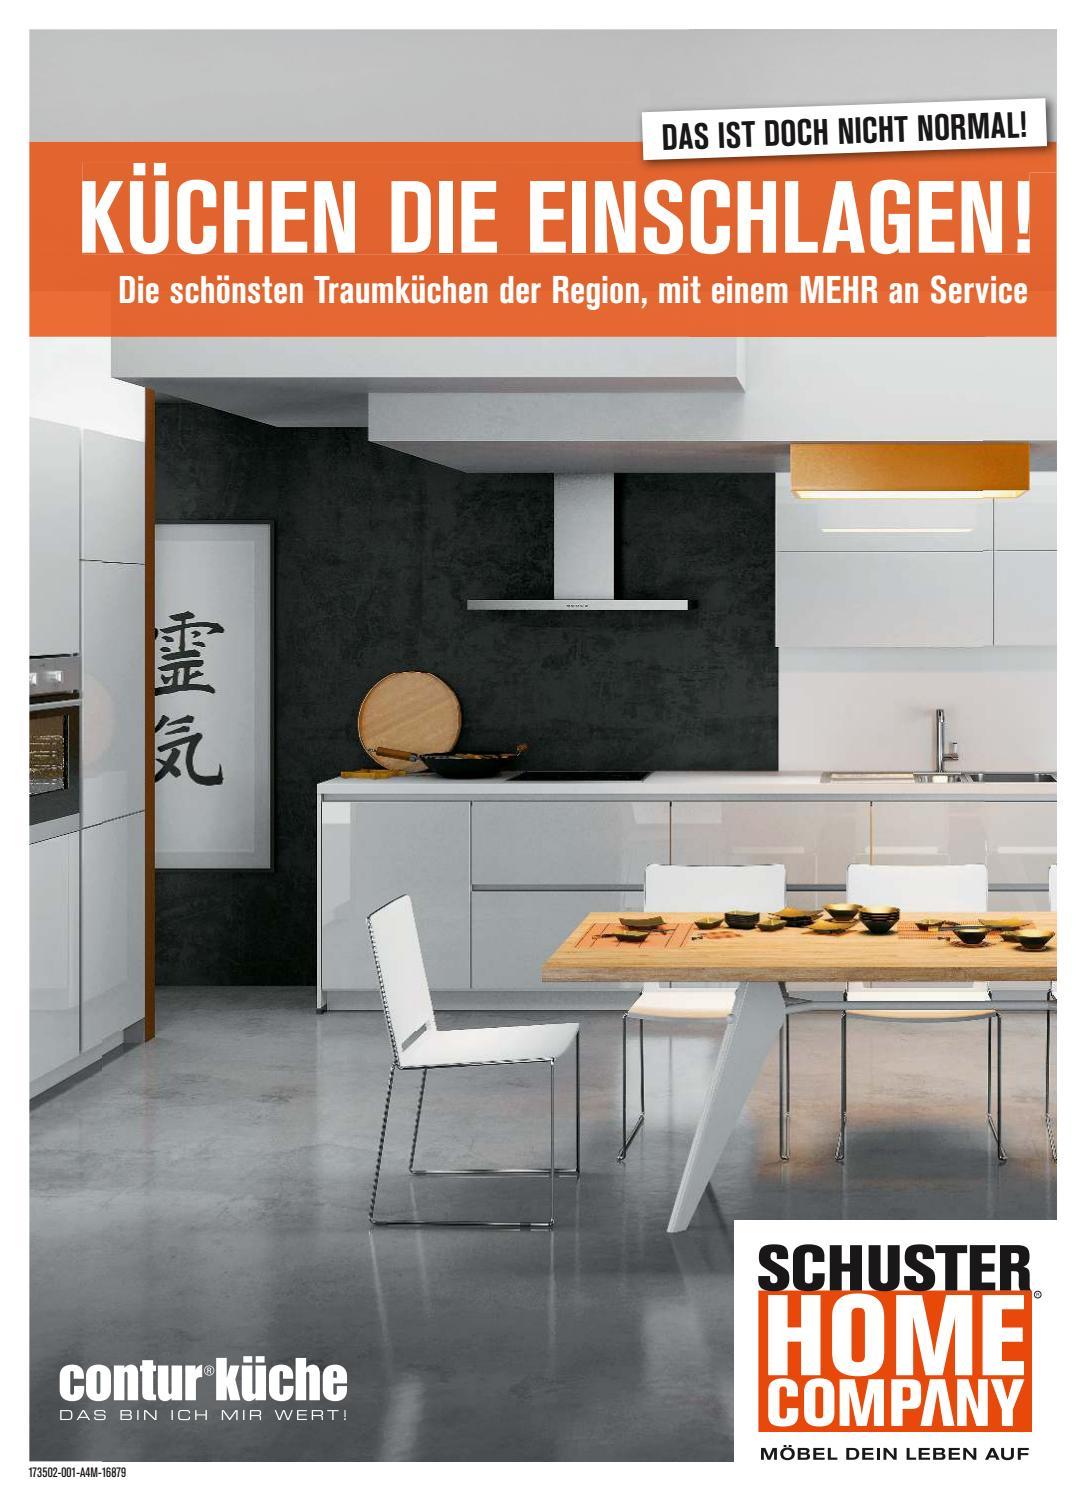 schuster home company contur k chen 2017 by perspektive werbeagentur issuu. Black Bedroom Furniture Sets. Home Design Ideas